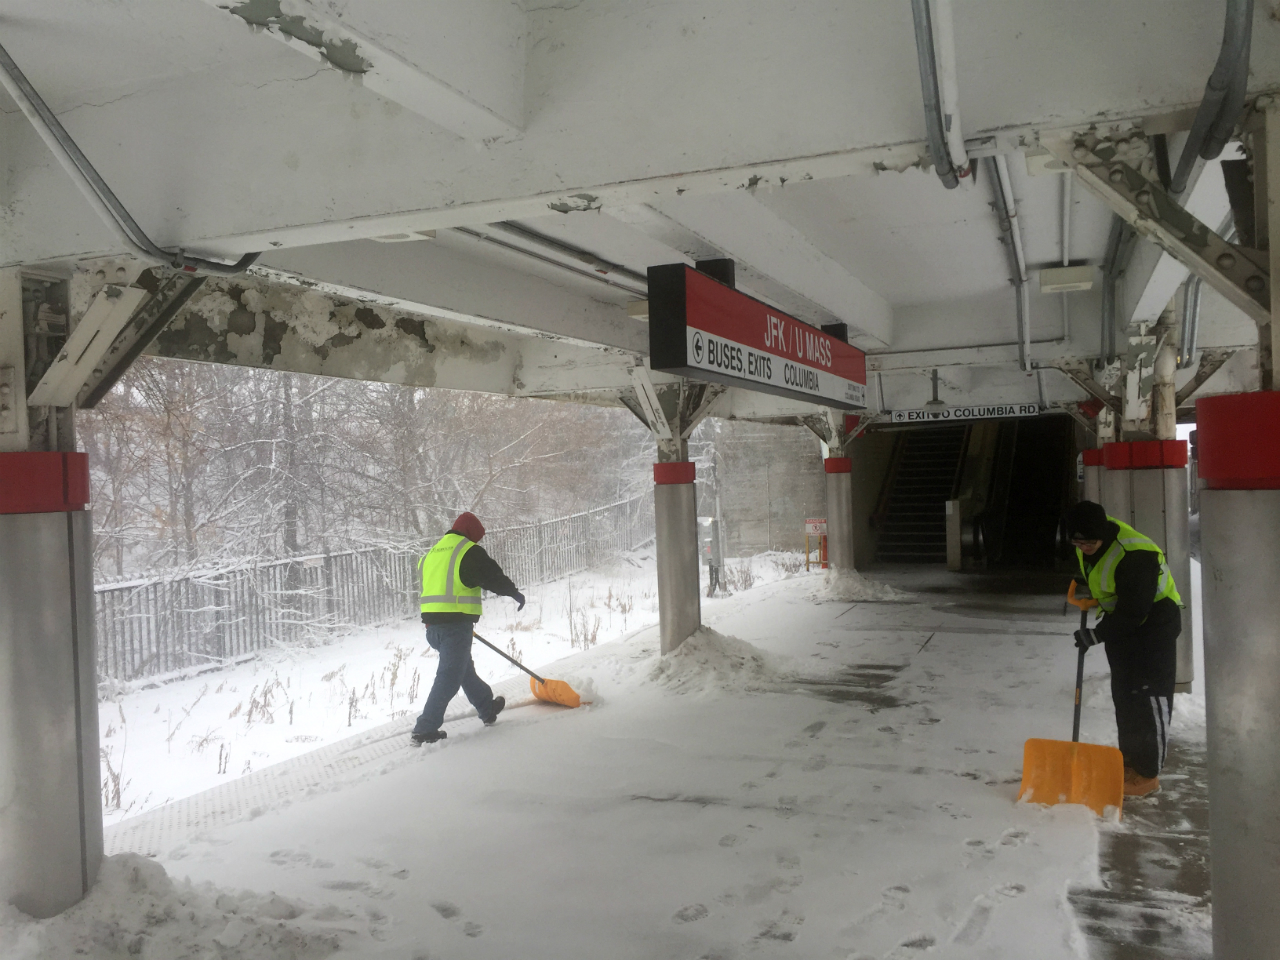 jfk-umass-shoveling-platform.jpg